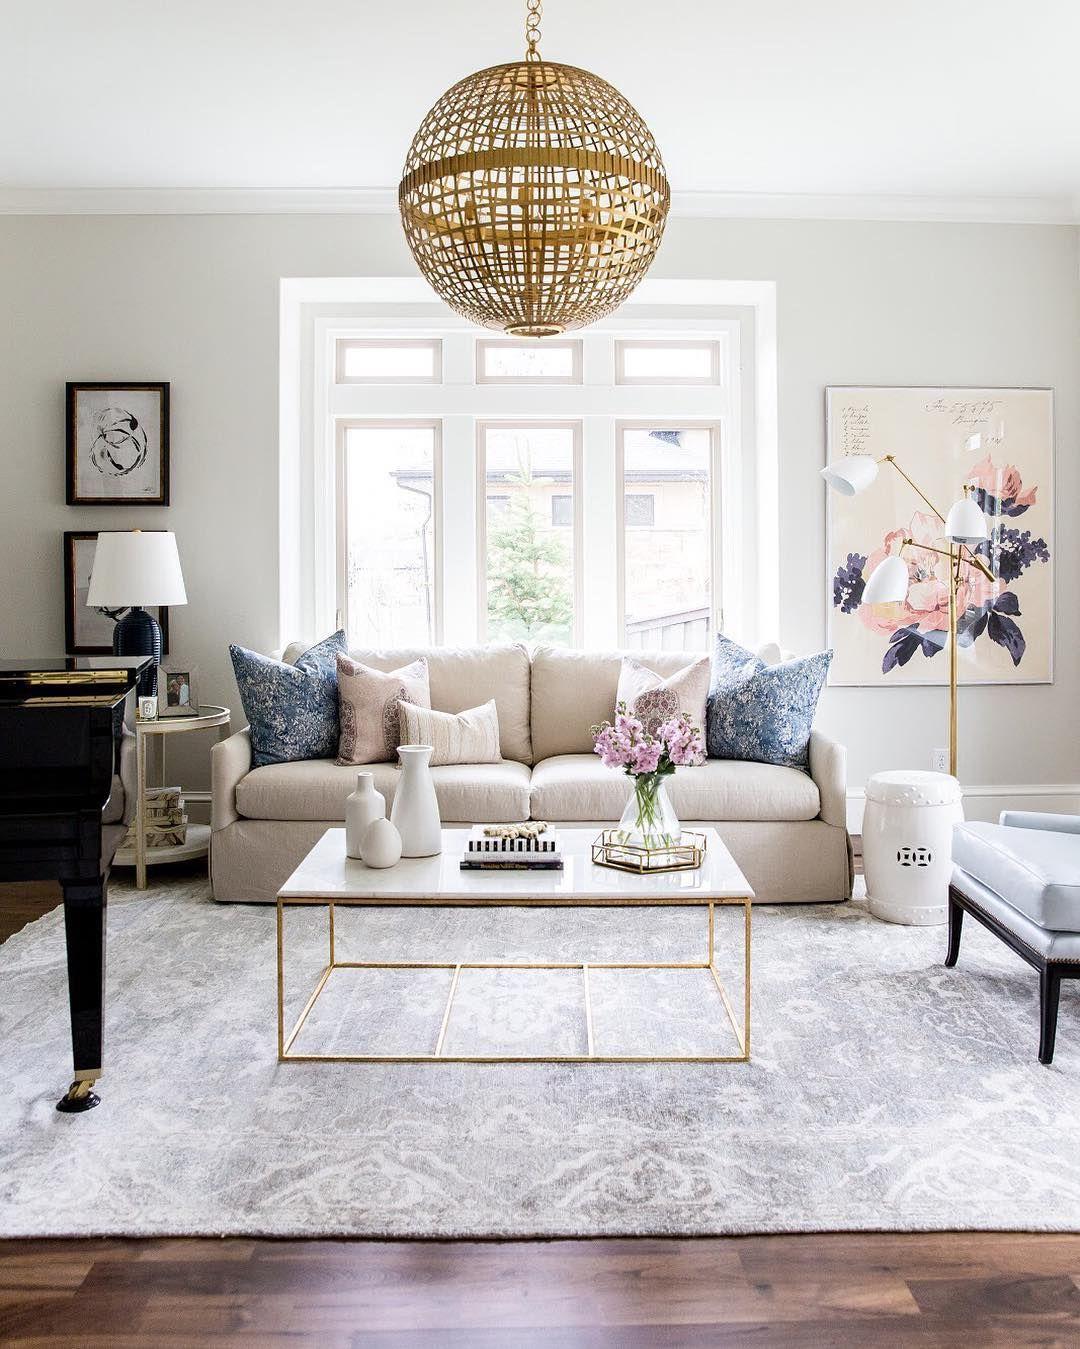 Formal living room | Martin Home | Pinterest | Formal living rooms ...